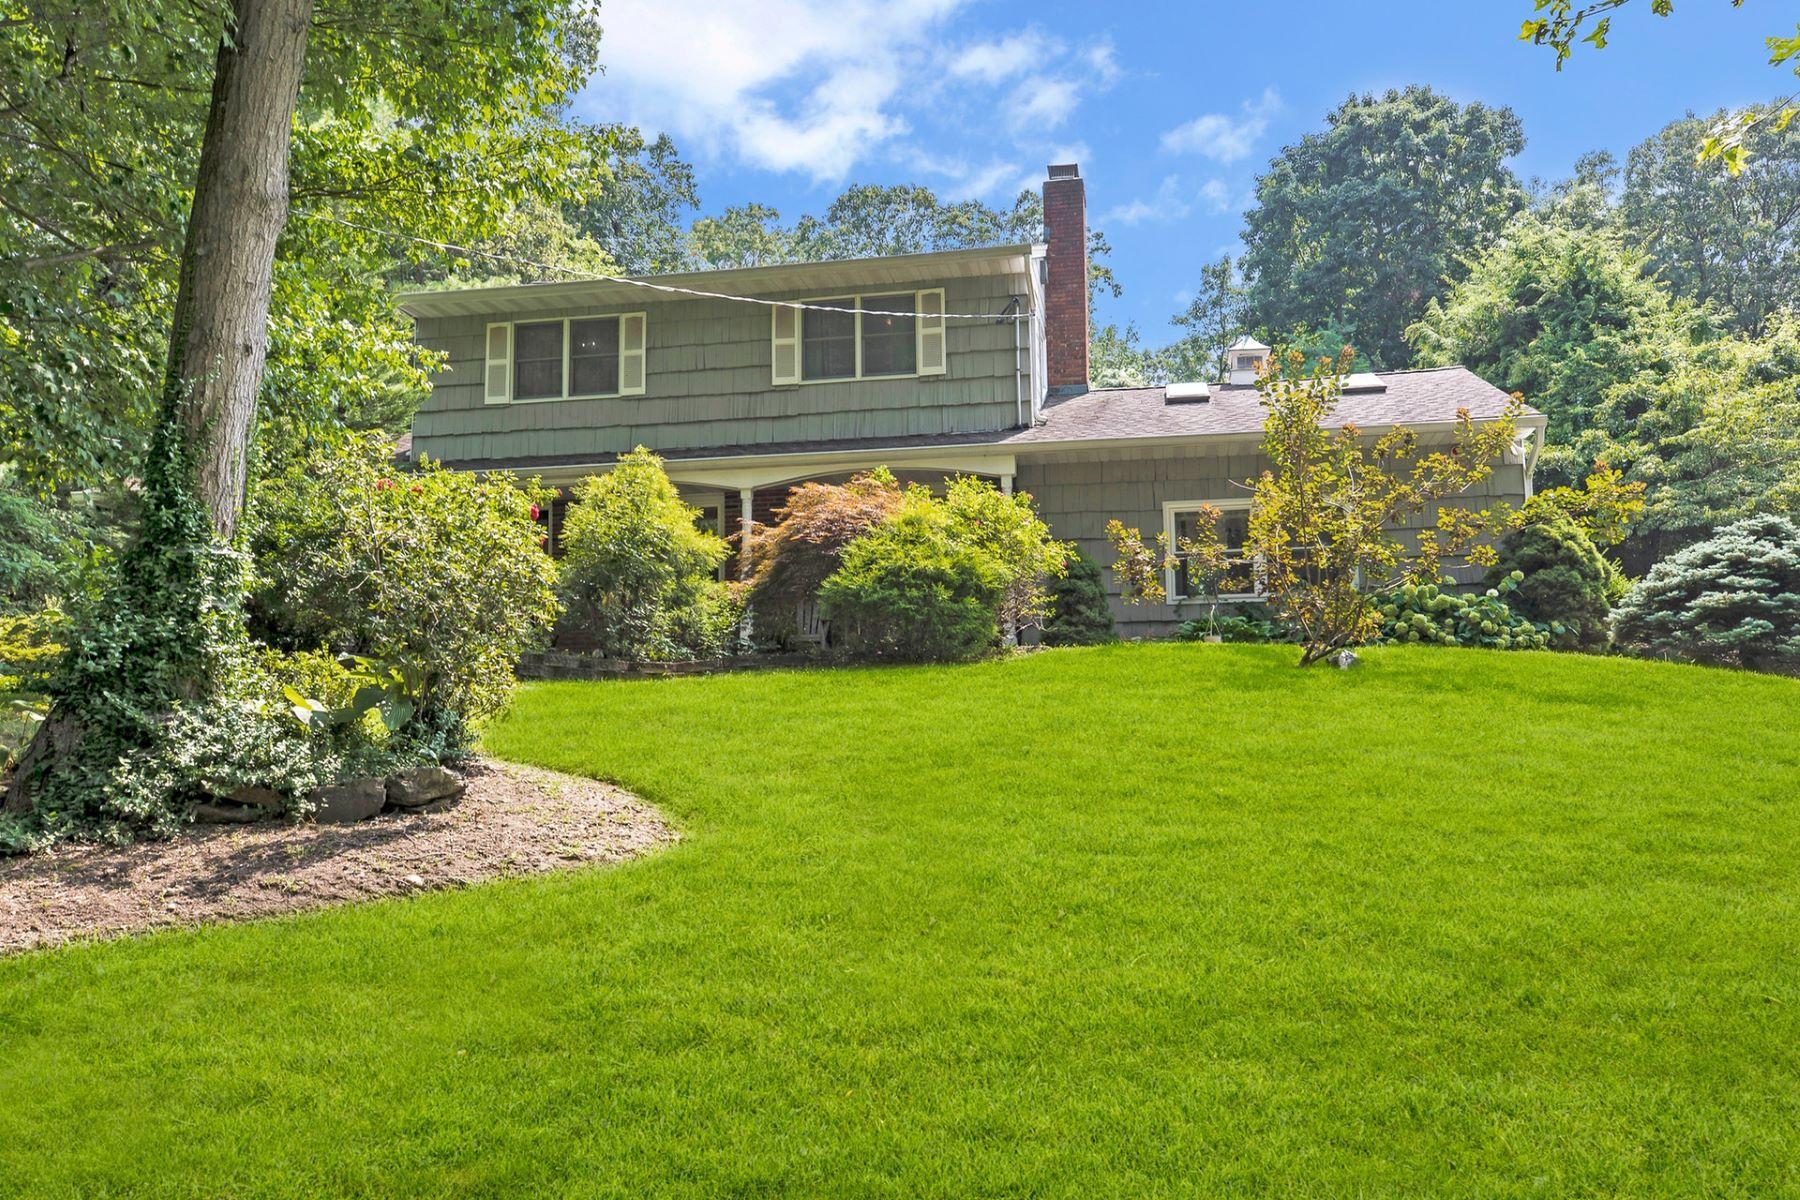 Single Family Homes for Sale at Dix Hills 18 Villanova Ln Dix Hills, New York 11746 United States